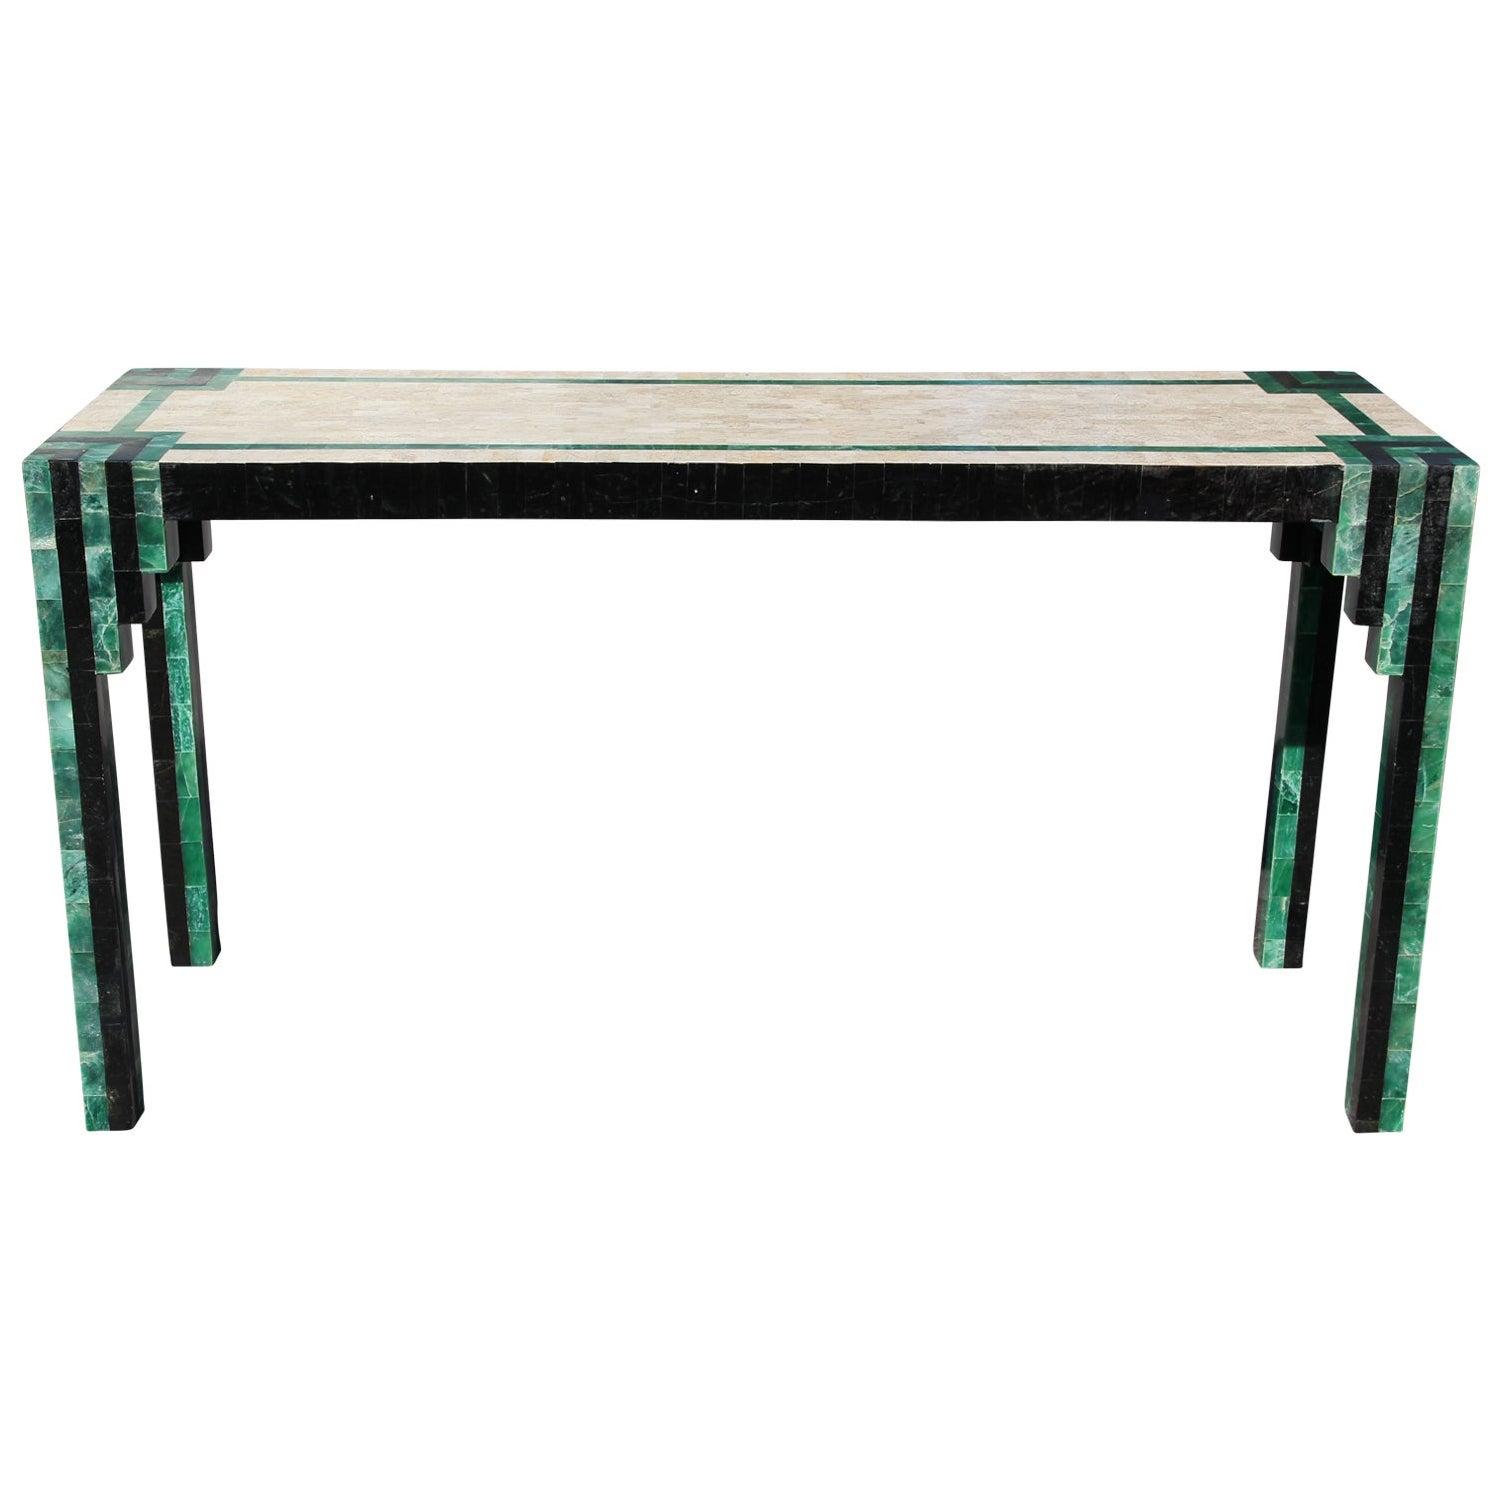 Geometric Deco Modern Tessellated Green / Black Console Table Karl Springer